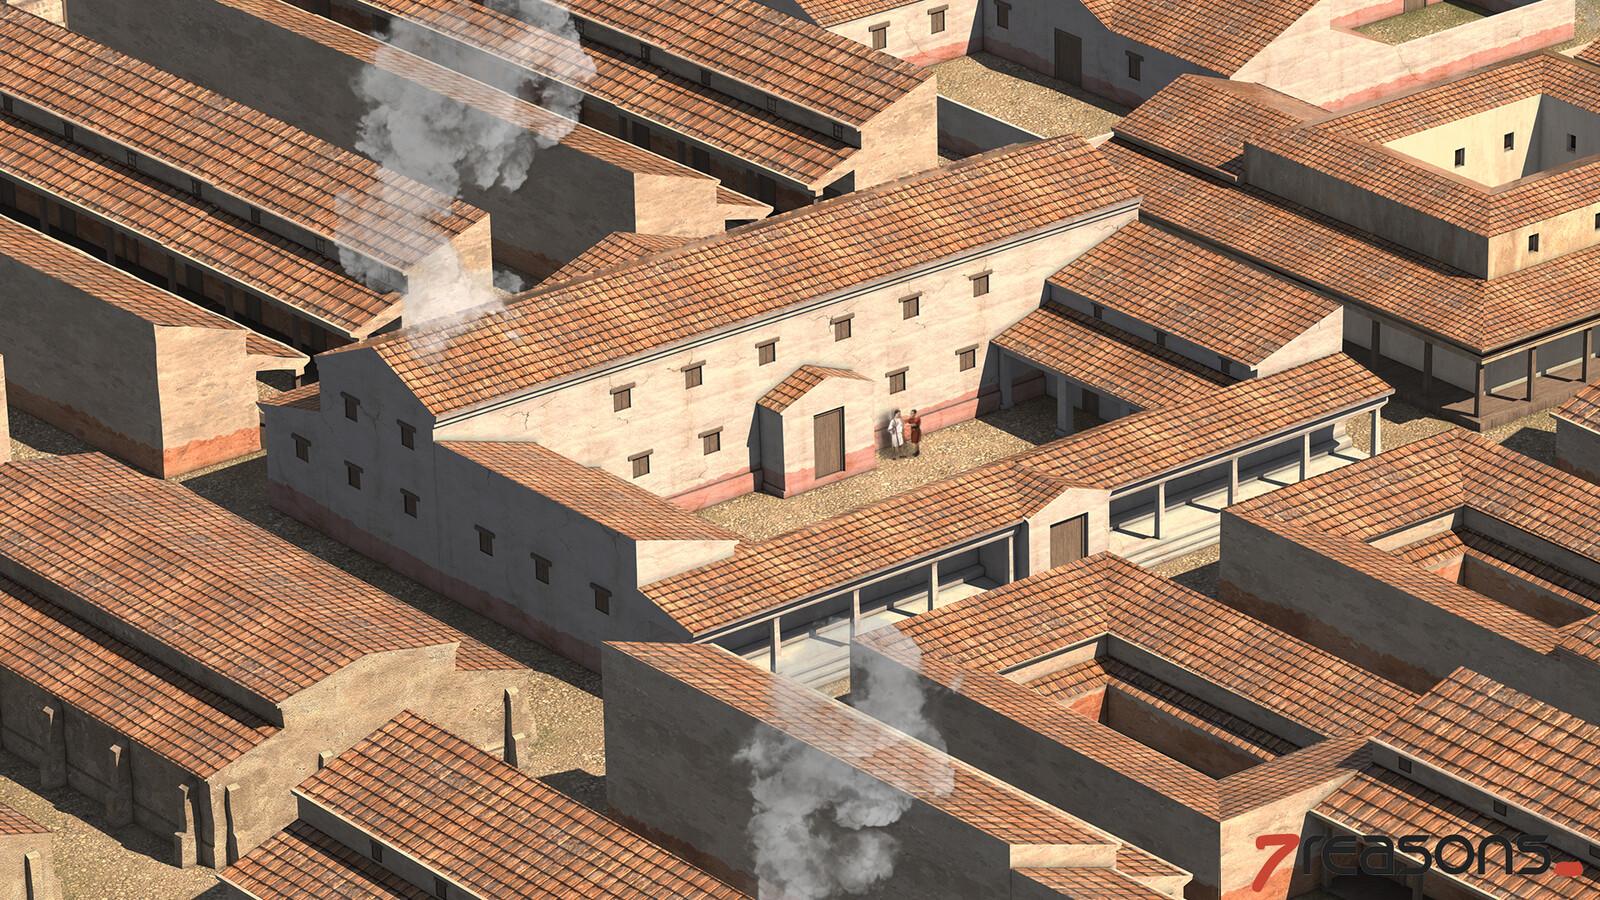 Roman Auxiliary Fortress - Principia (Headquarters)